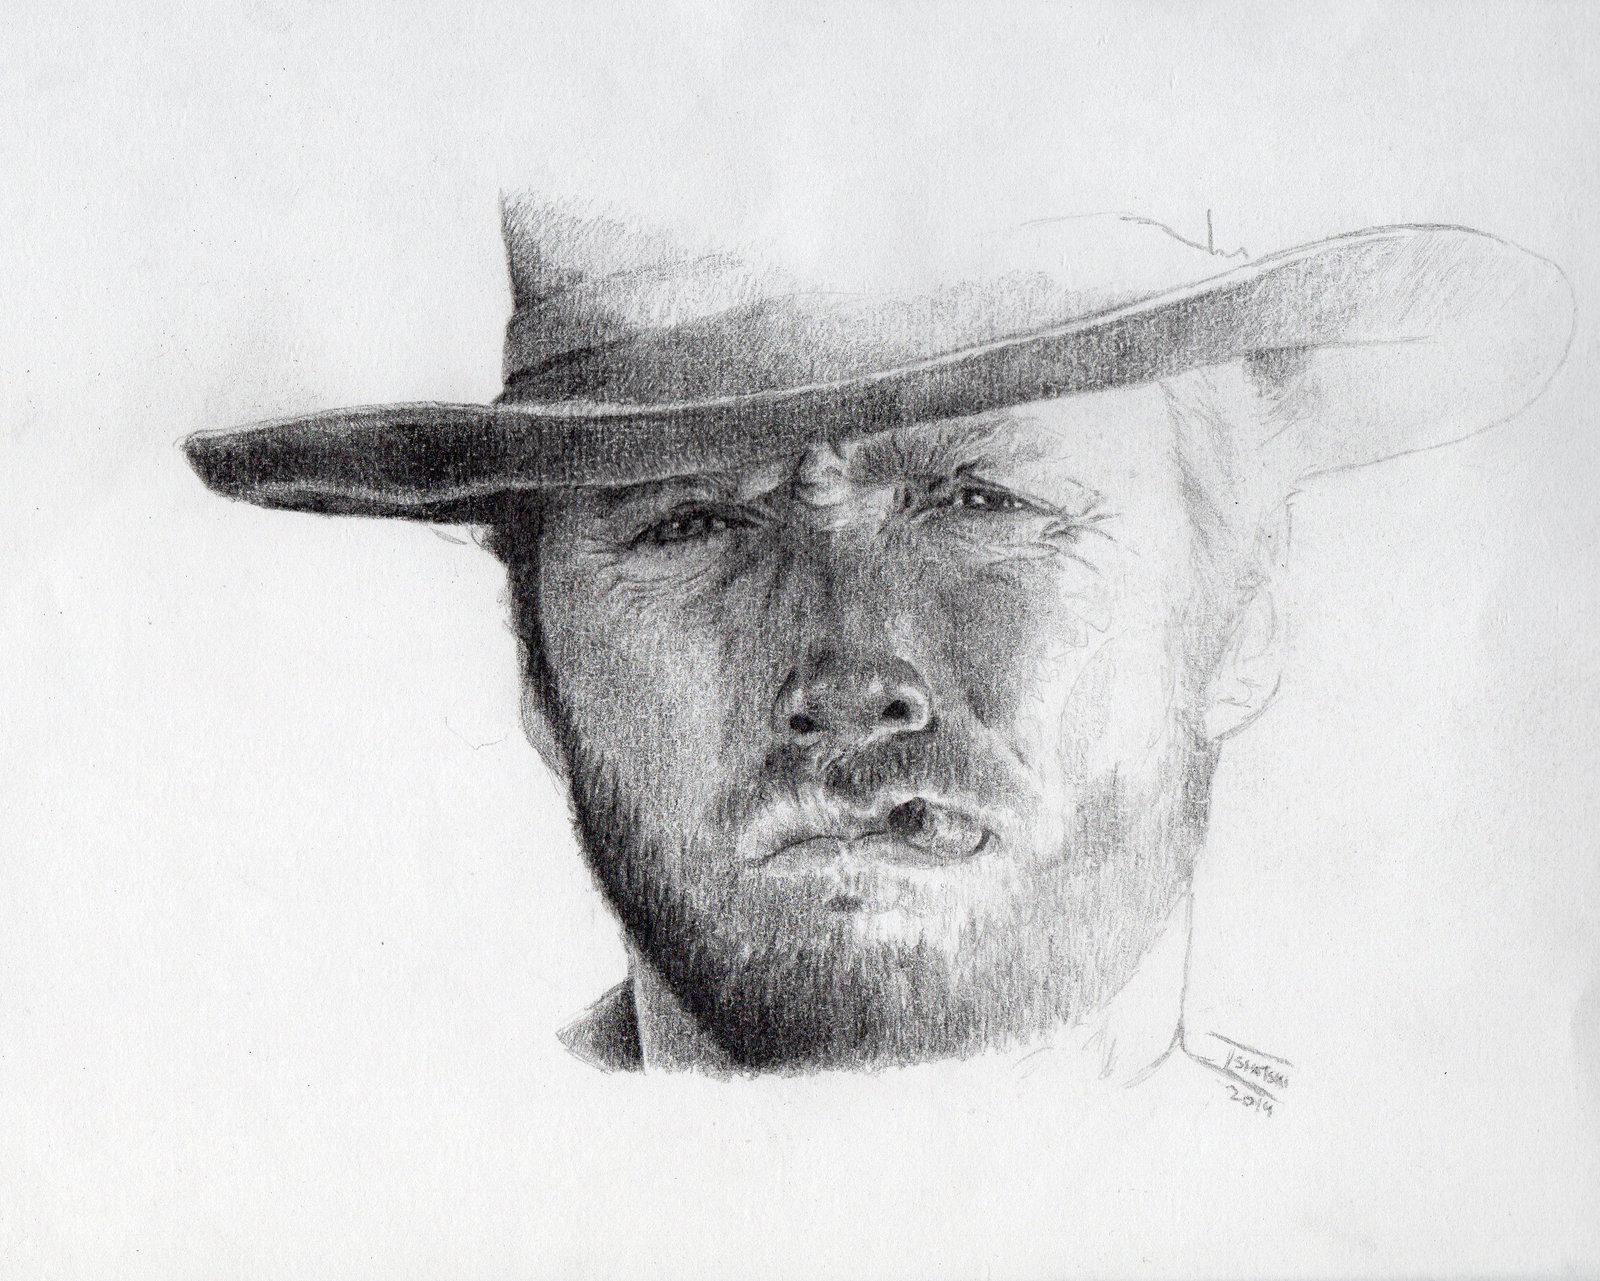 Clint2